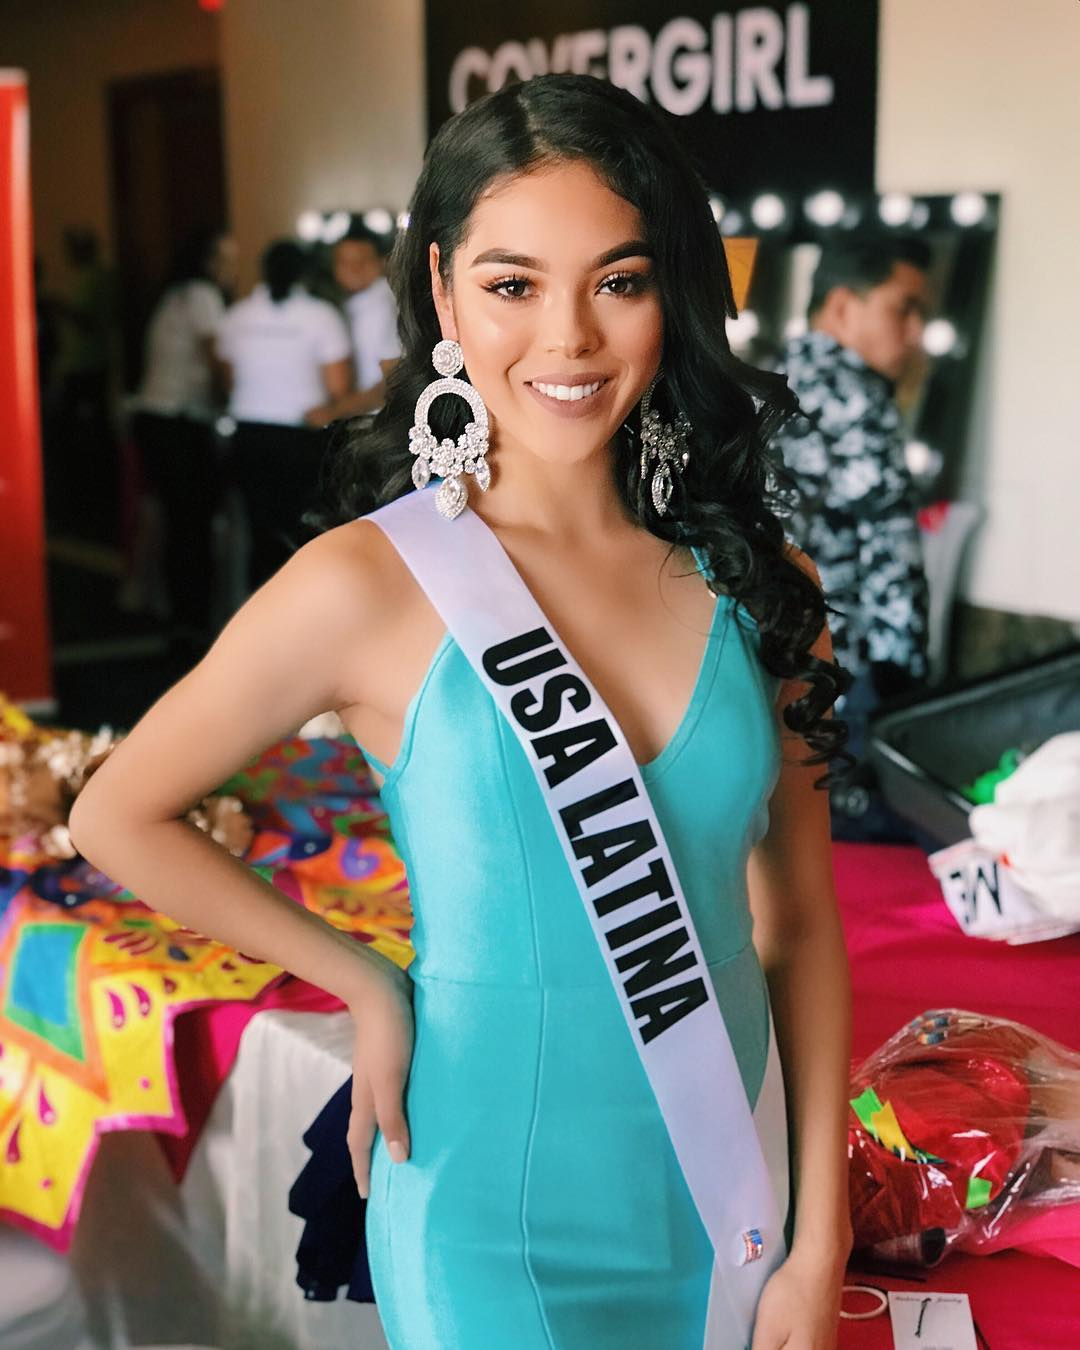 kristian de leon, miss teen mundial usa 2019/top 16 de teen universe 2018. - Página 3 29403910